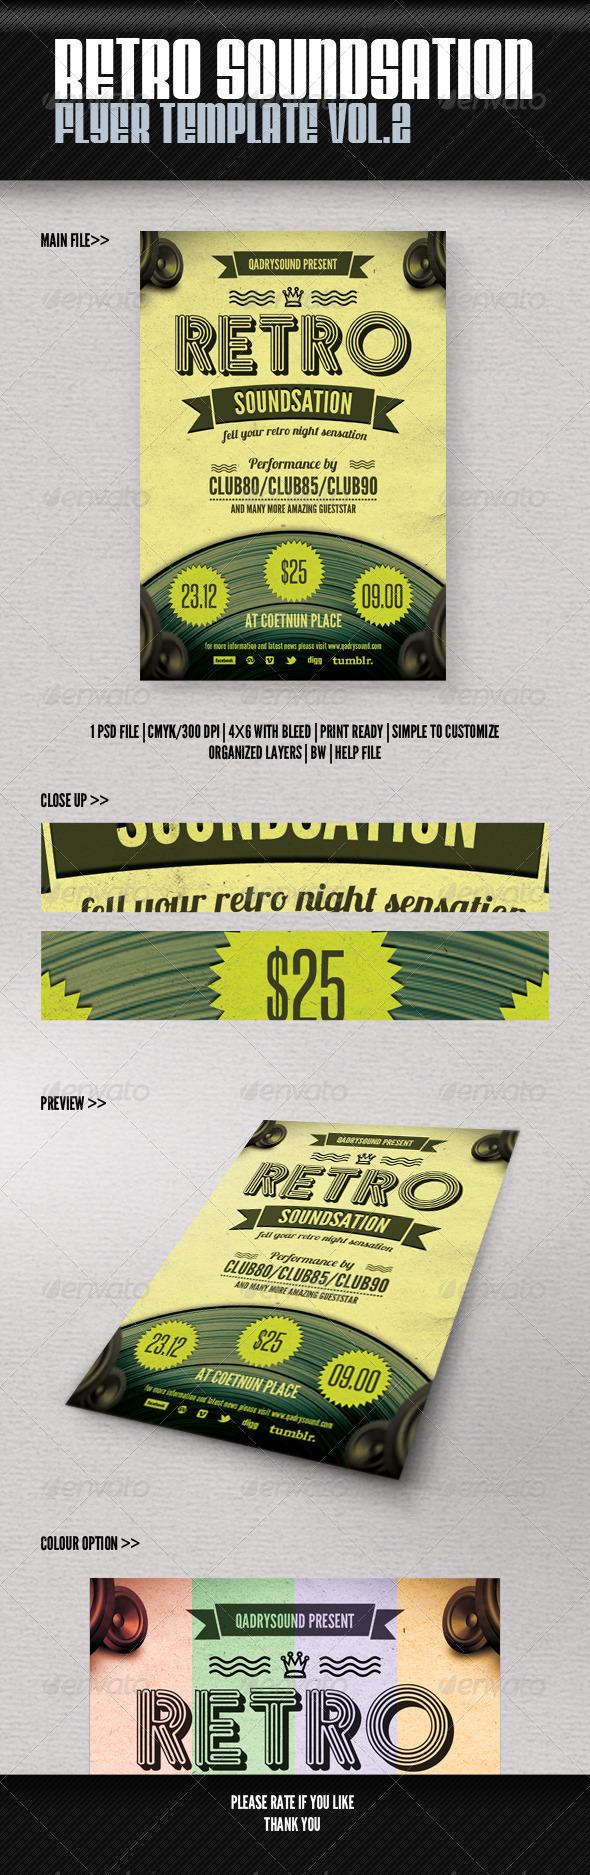 GraphicRiver Retro Soundsation Flyer Vol 2 4764477